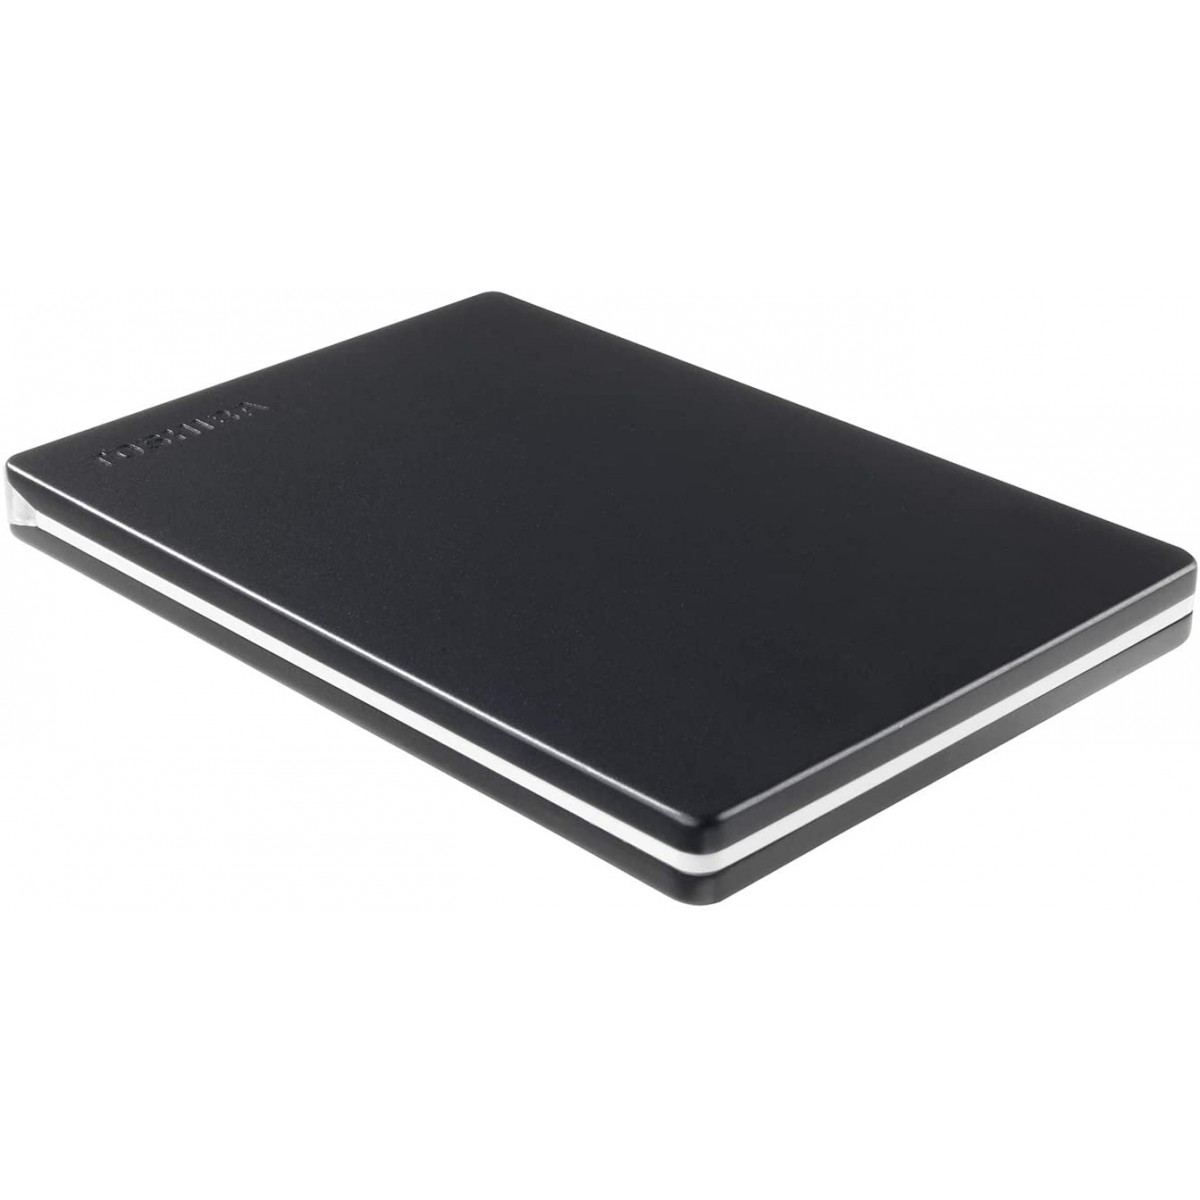 HD Externo Portátil Toshiba Canvio Slim 1TB USB 3.0, Black, HDTD310XK3DA